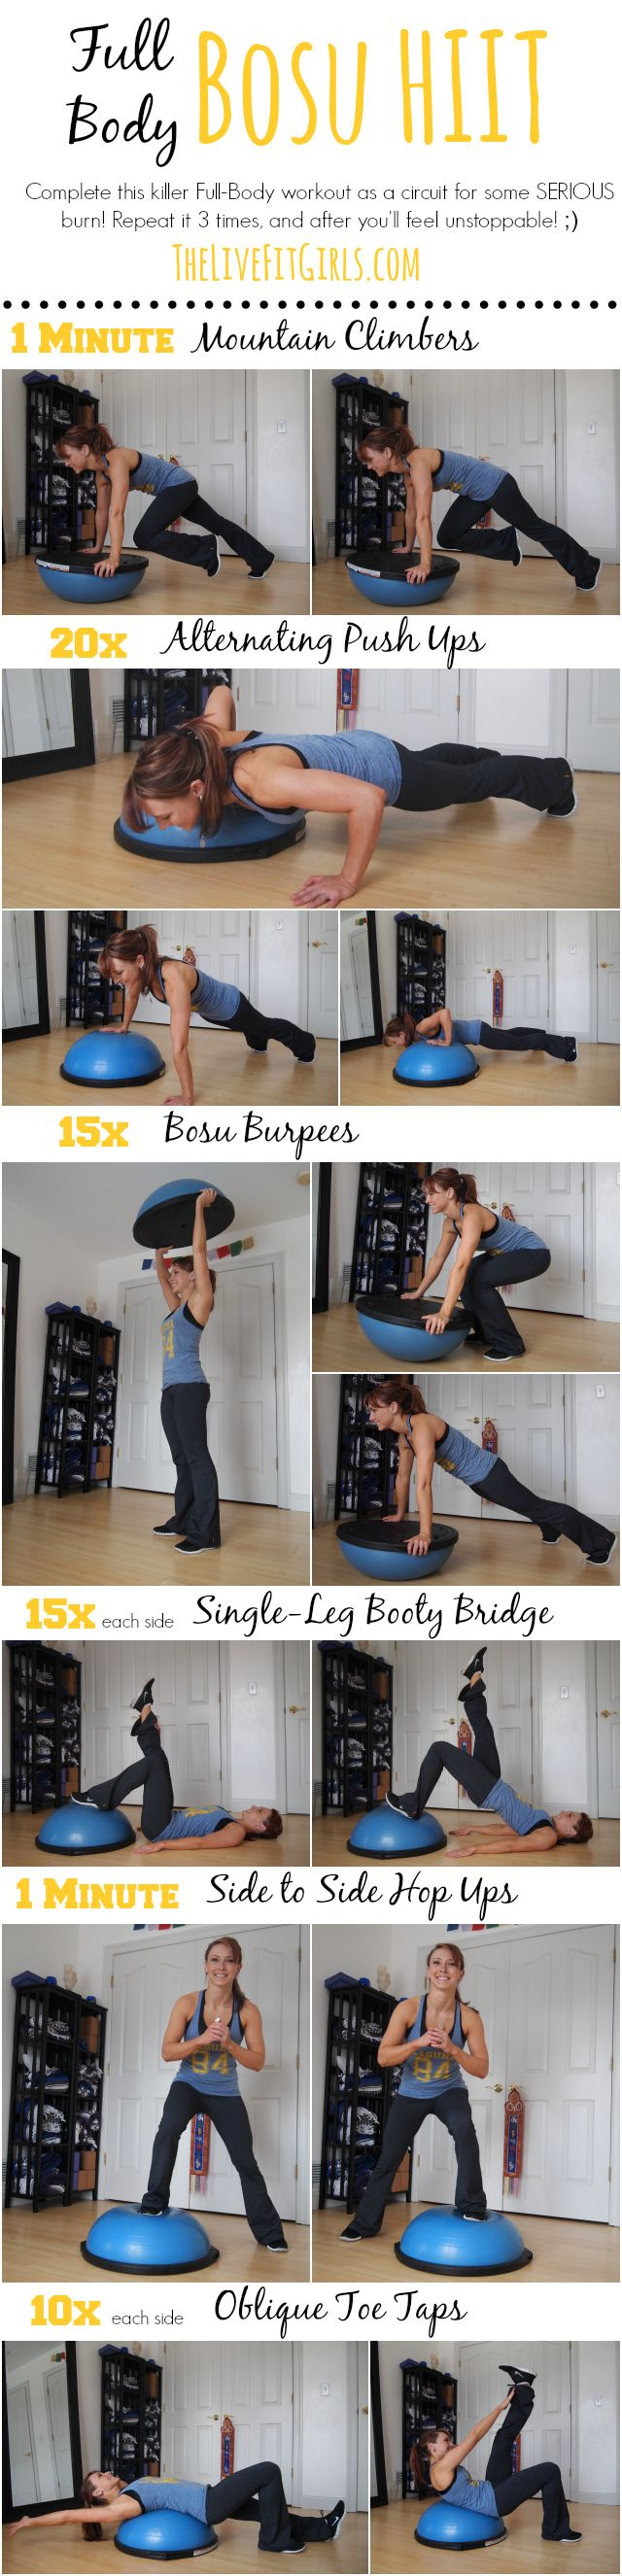 Bosu HIIT Workout, BOSU Body Blast! Head to toe toning and strengthening with the BOSU! #pei